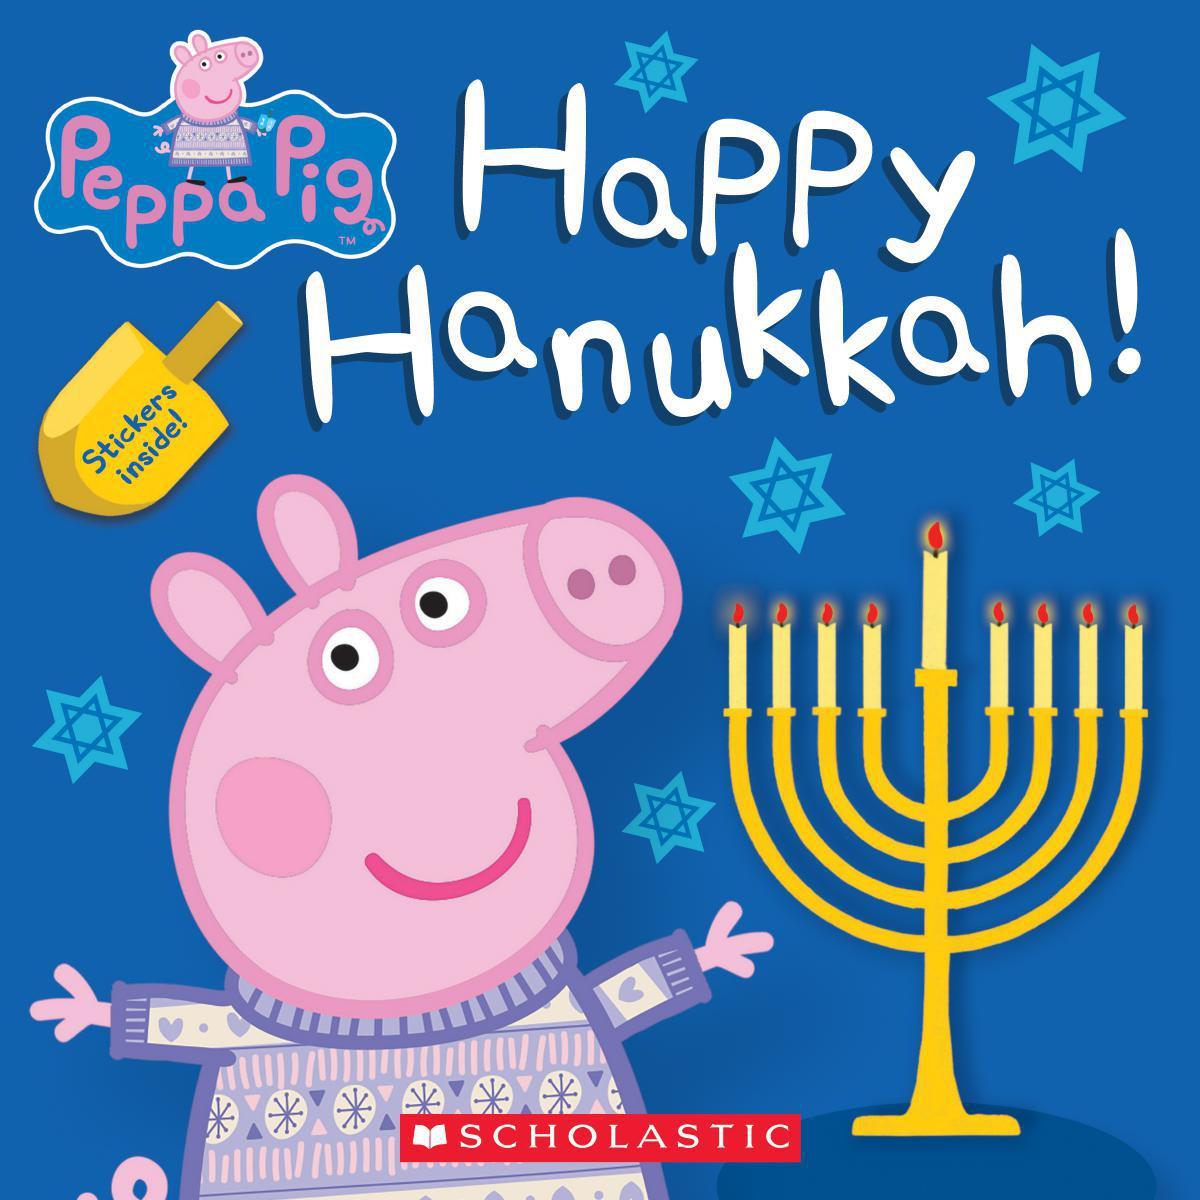 Peppa Pig: Happy Hanukkah!